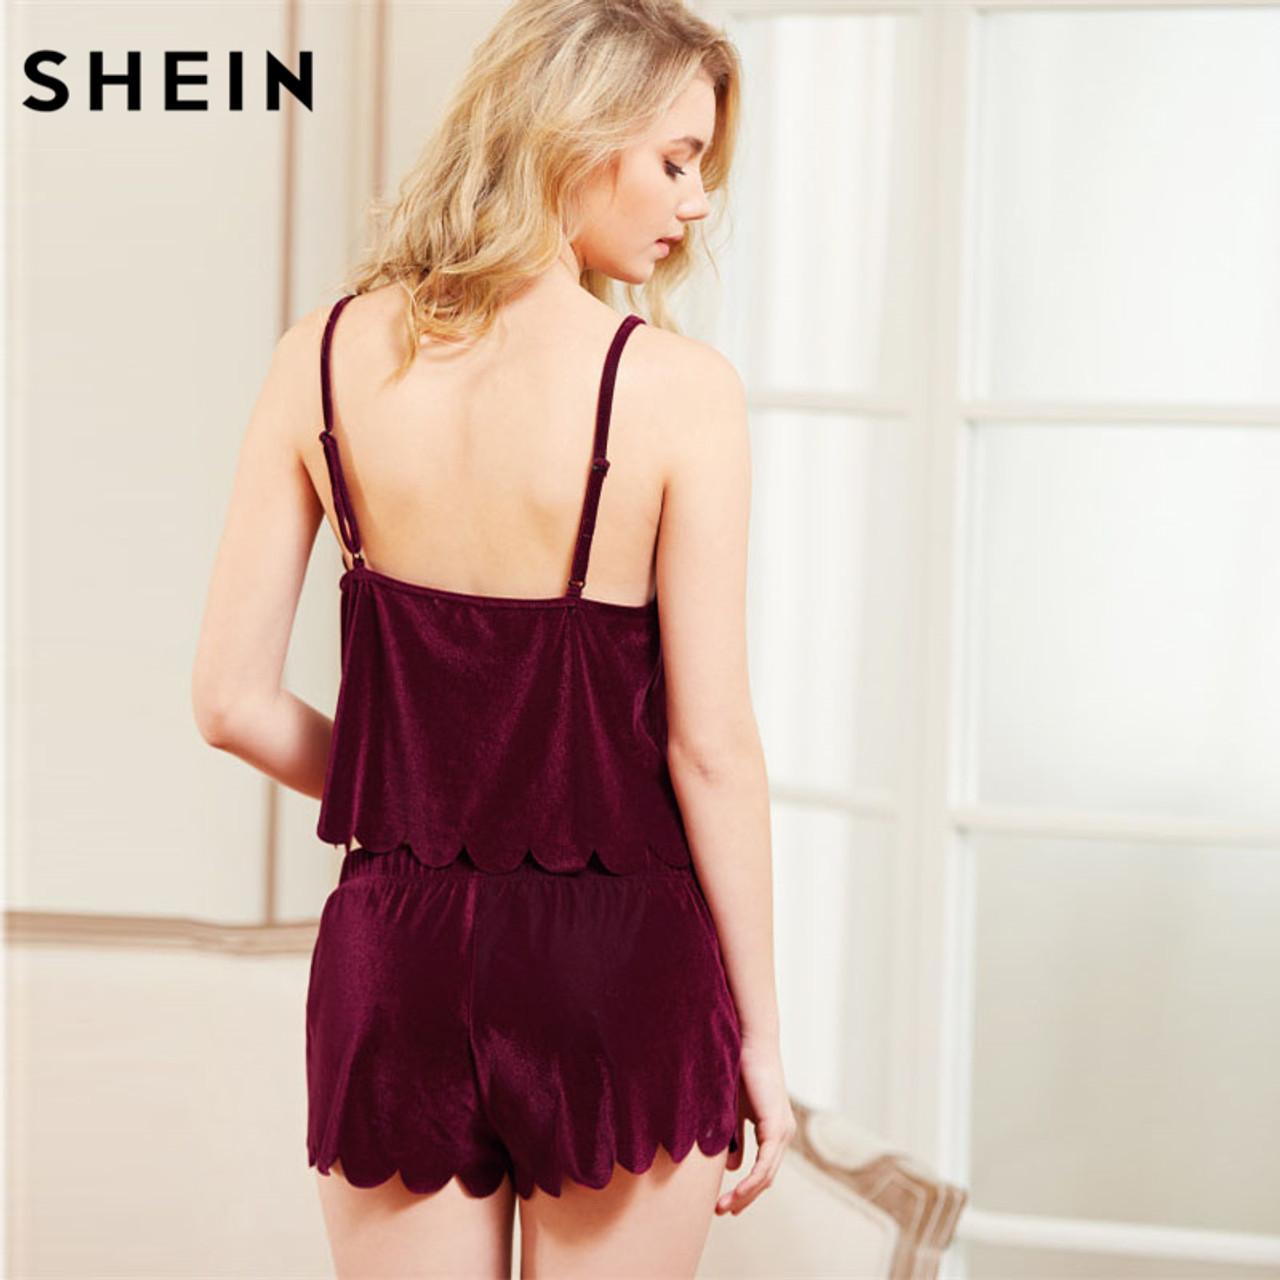 8058e663a4 ... SHEIN Women Sleeping Summer Nightwear Pyjama Burgundy Spaghetti Strap  Scalloped Trim Velvet Cami Top & ...